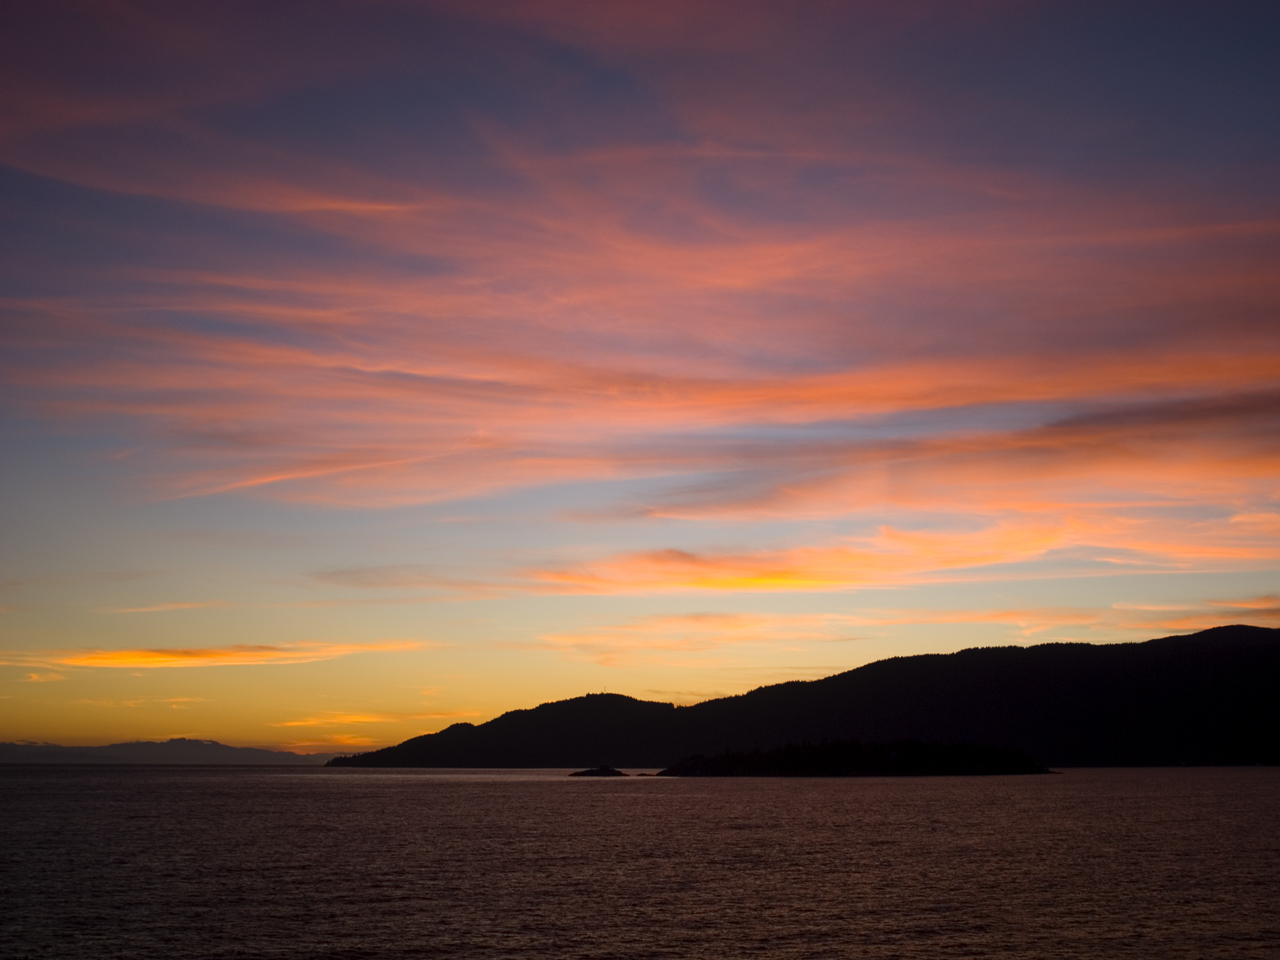 Bowen island | © pentaboxes/Flickr